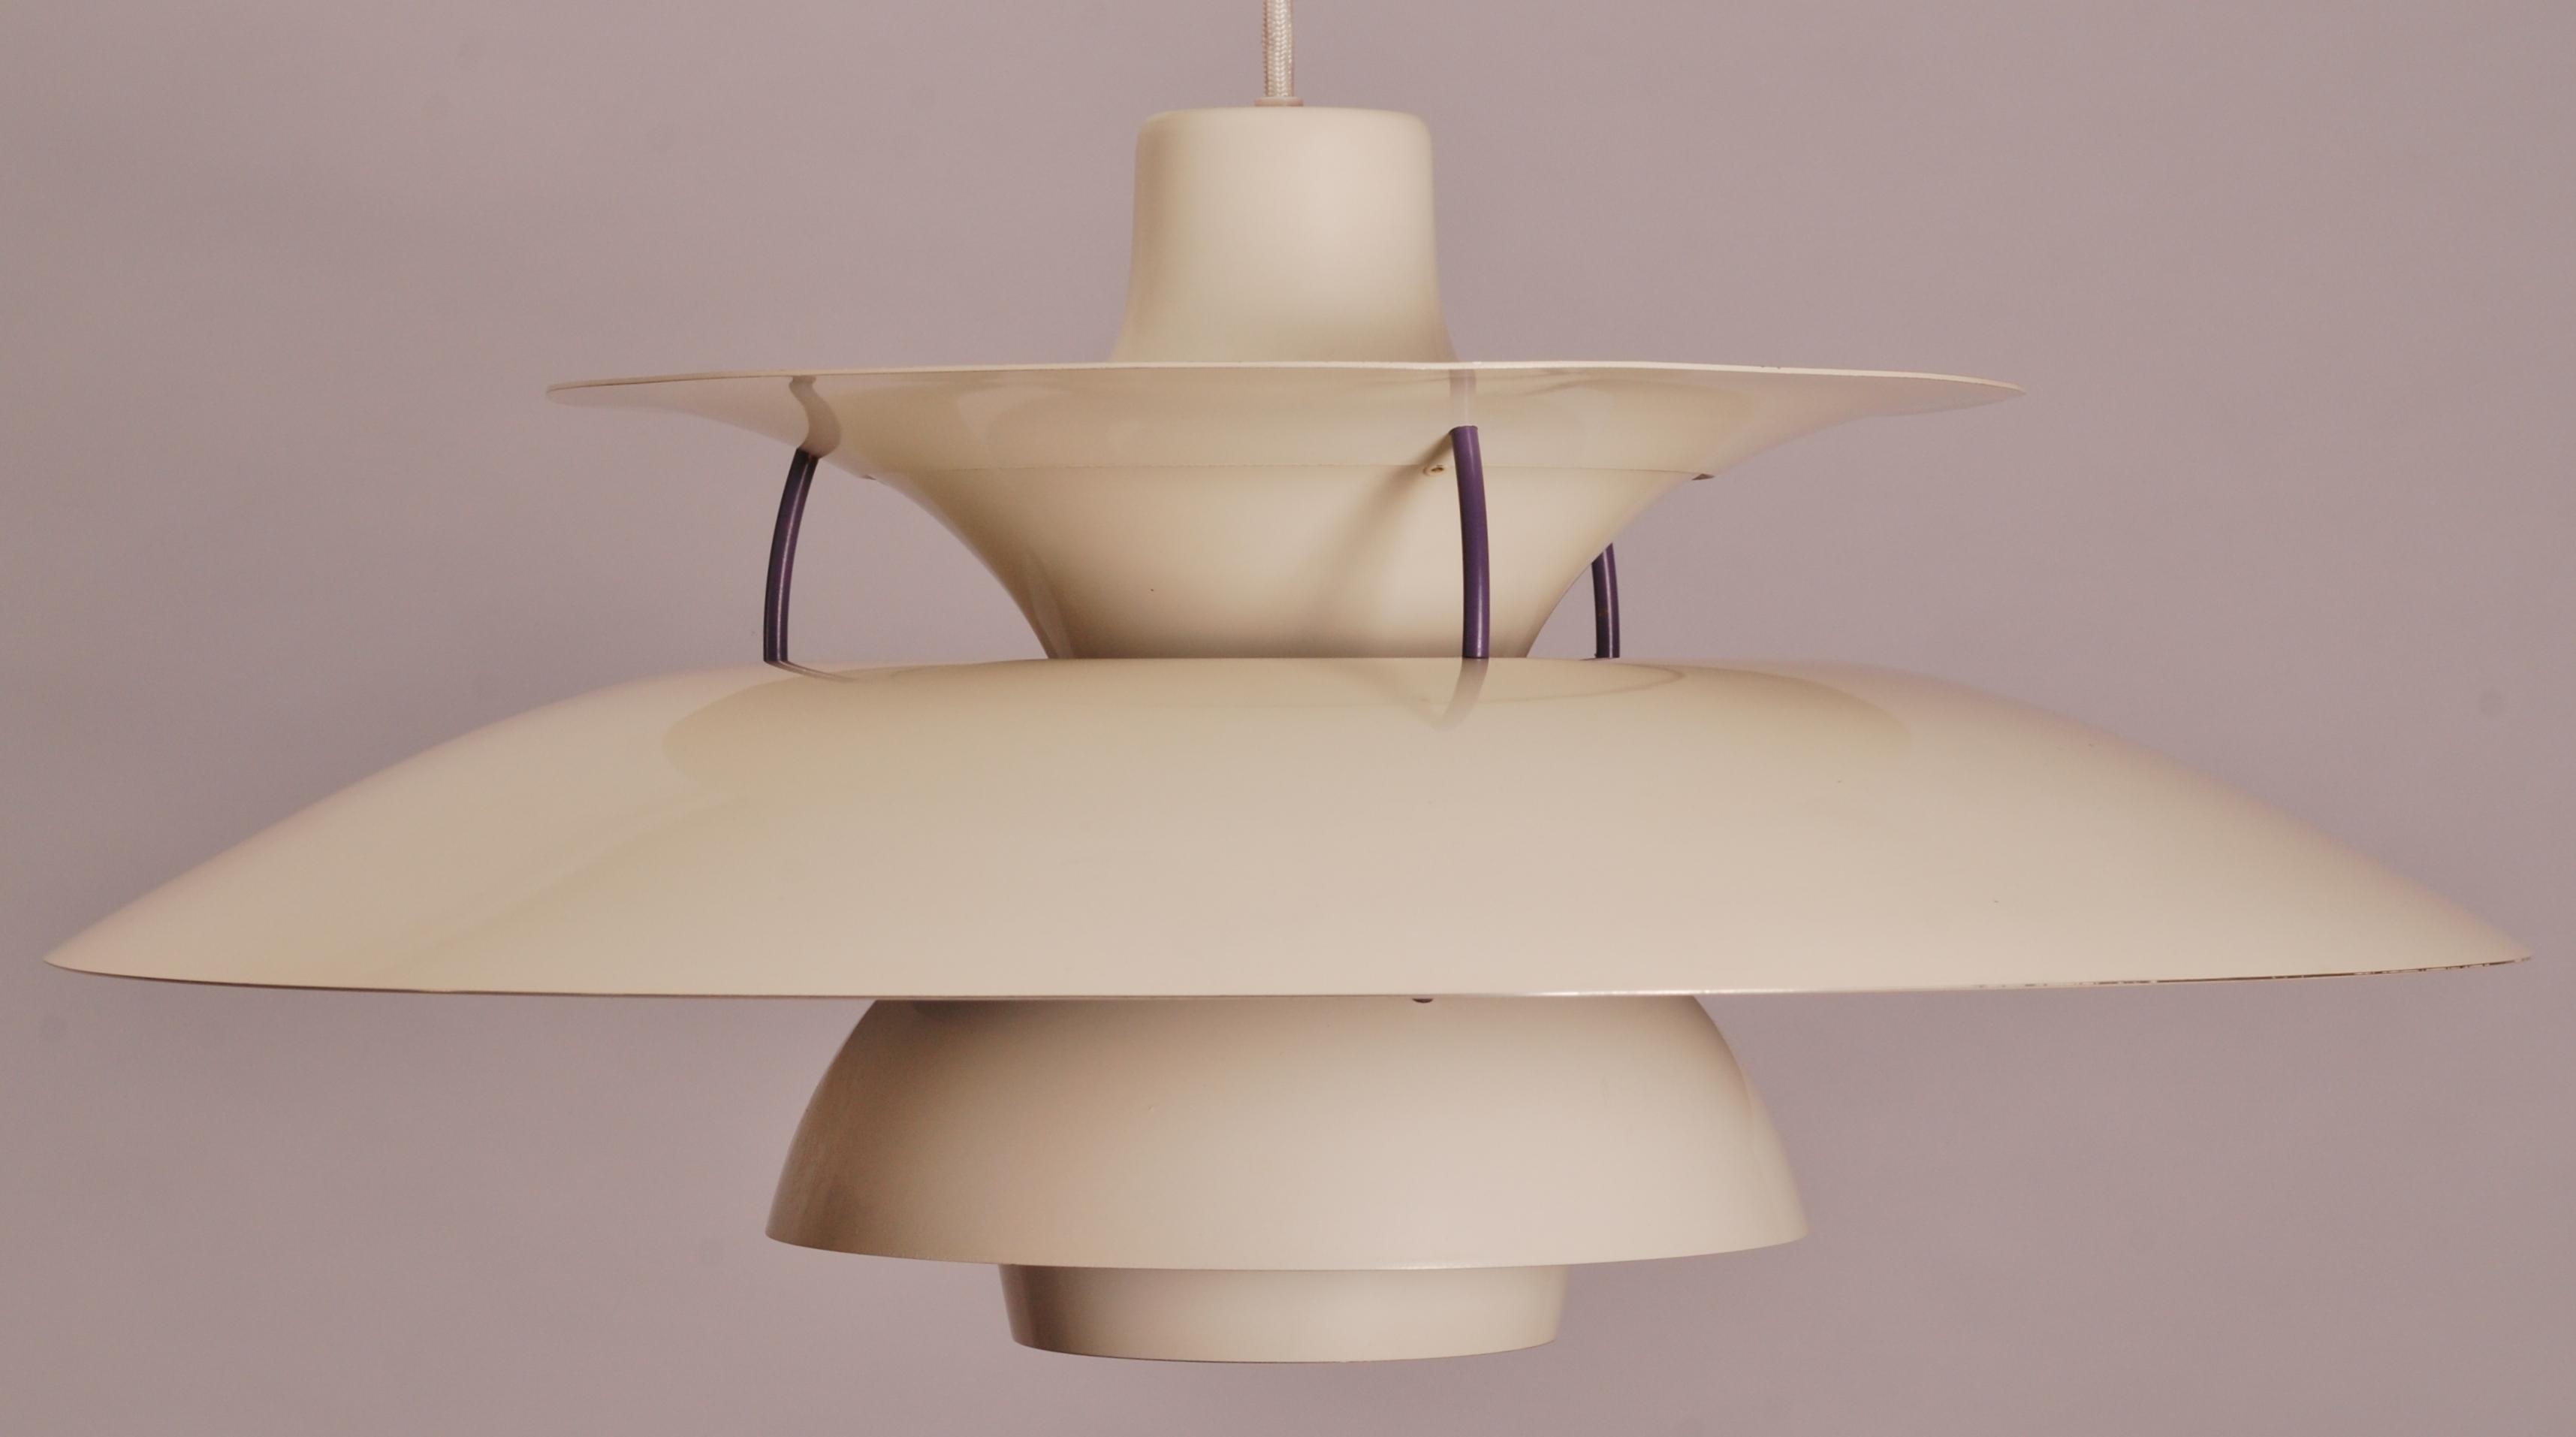 poul henningsen voor louis poulsen ph5 hanglamp willem koolmees. Black Bedroom Furniture Sets. Home Design Ideas